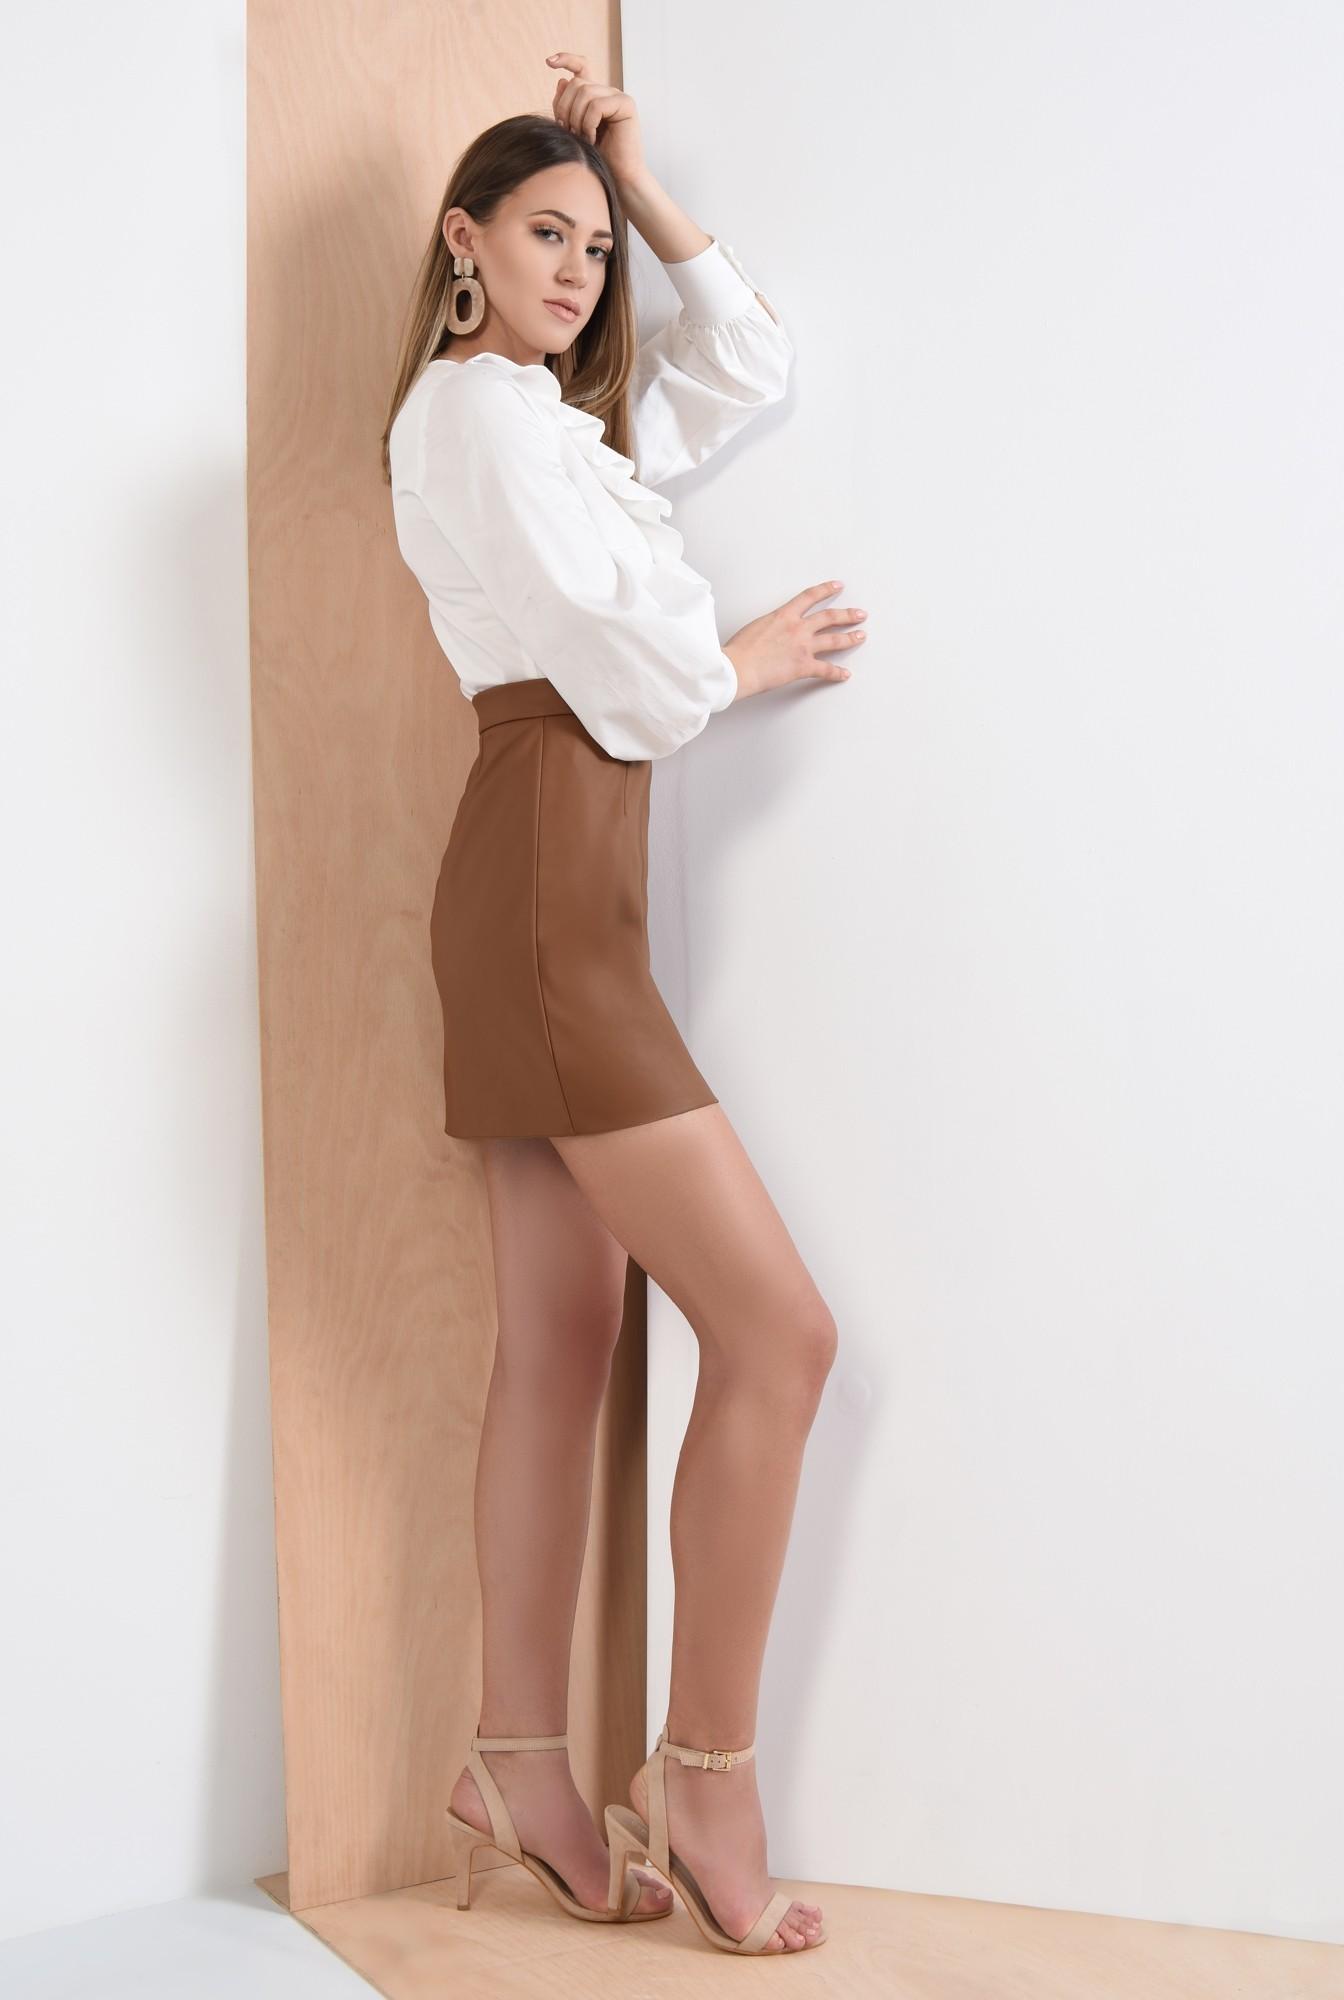 1 - fusta scurta, maro, piele ecologica, cu fermoar metalic, Poema